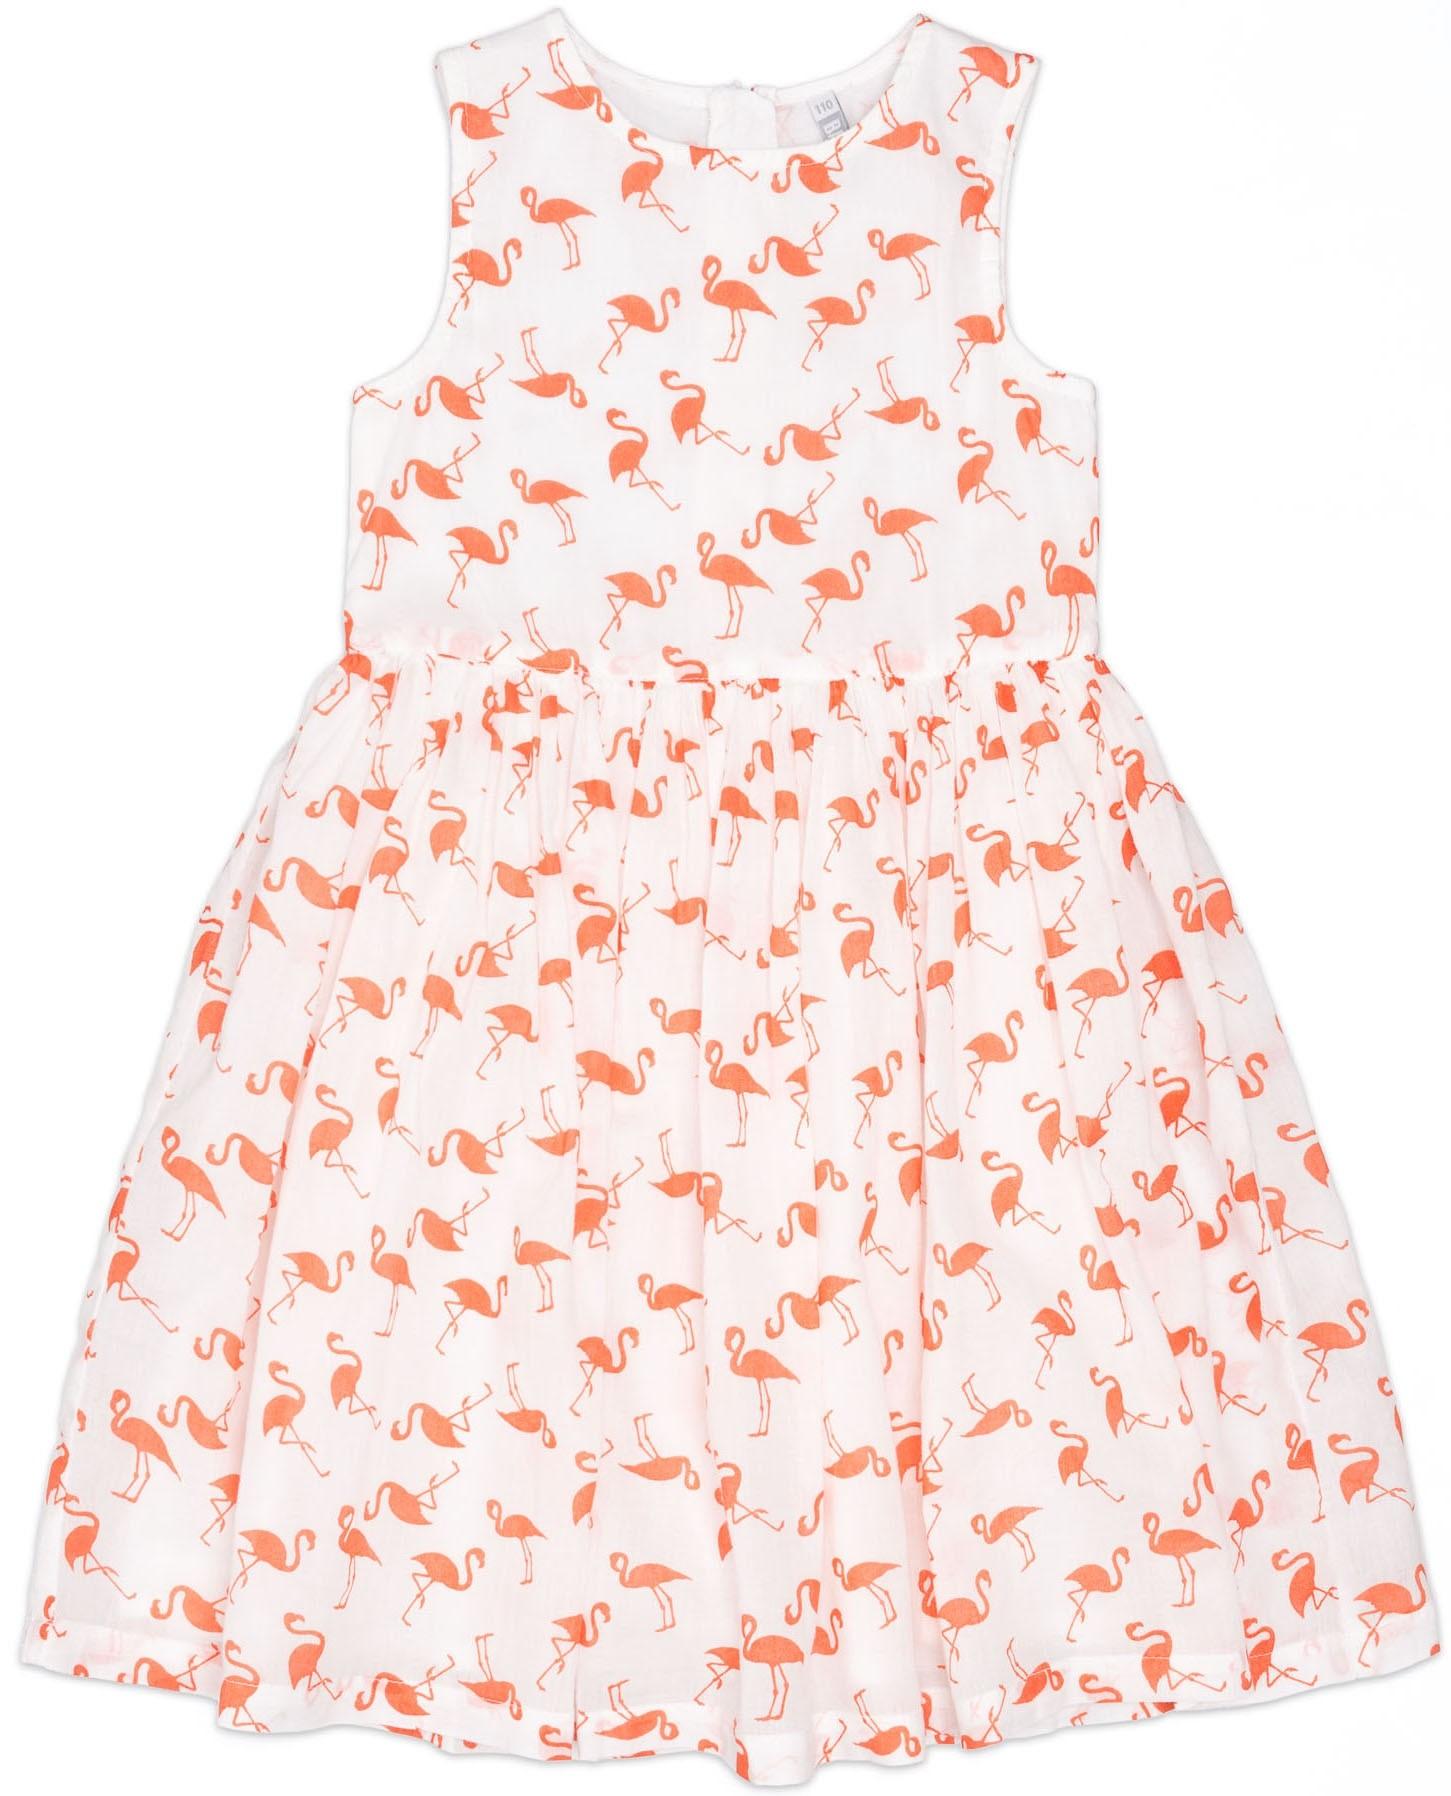 Платье без рукавов Barkito Фламинго 734014 X001 75